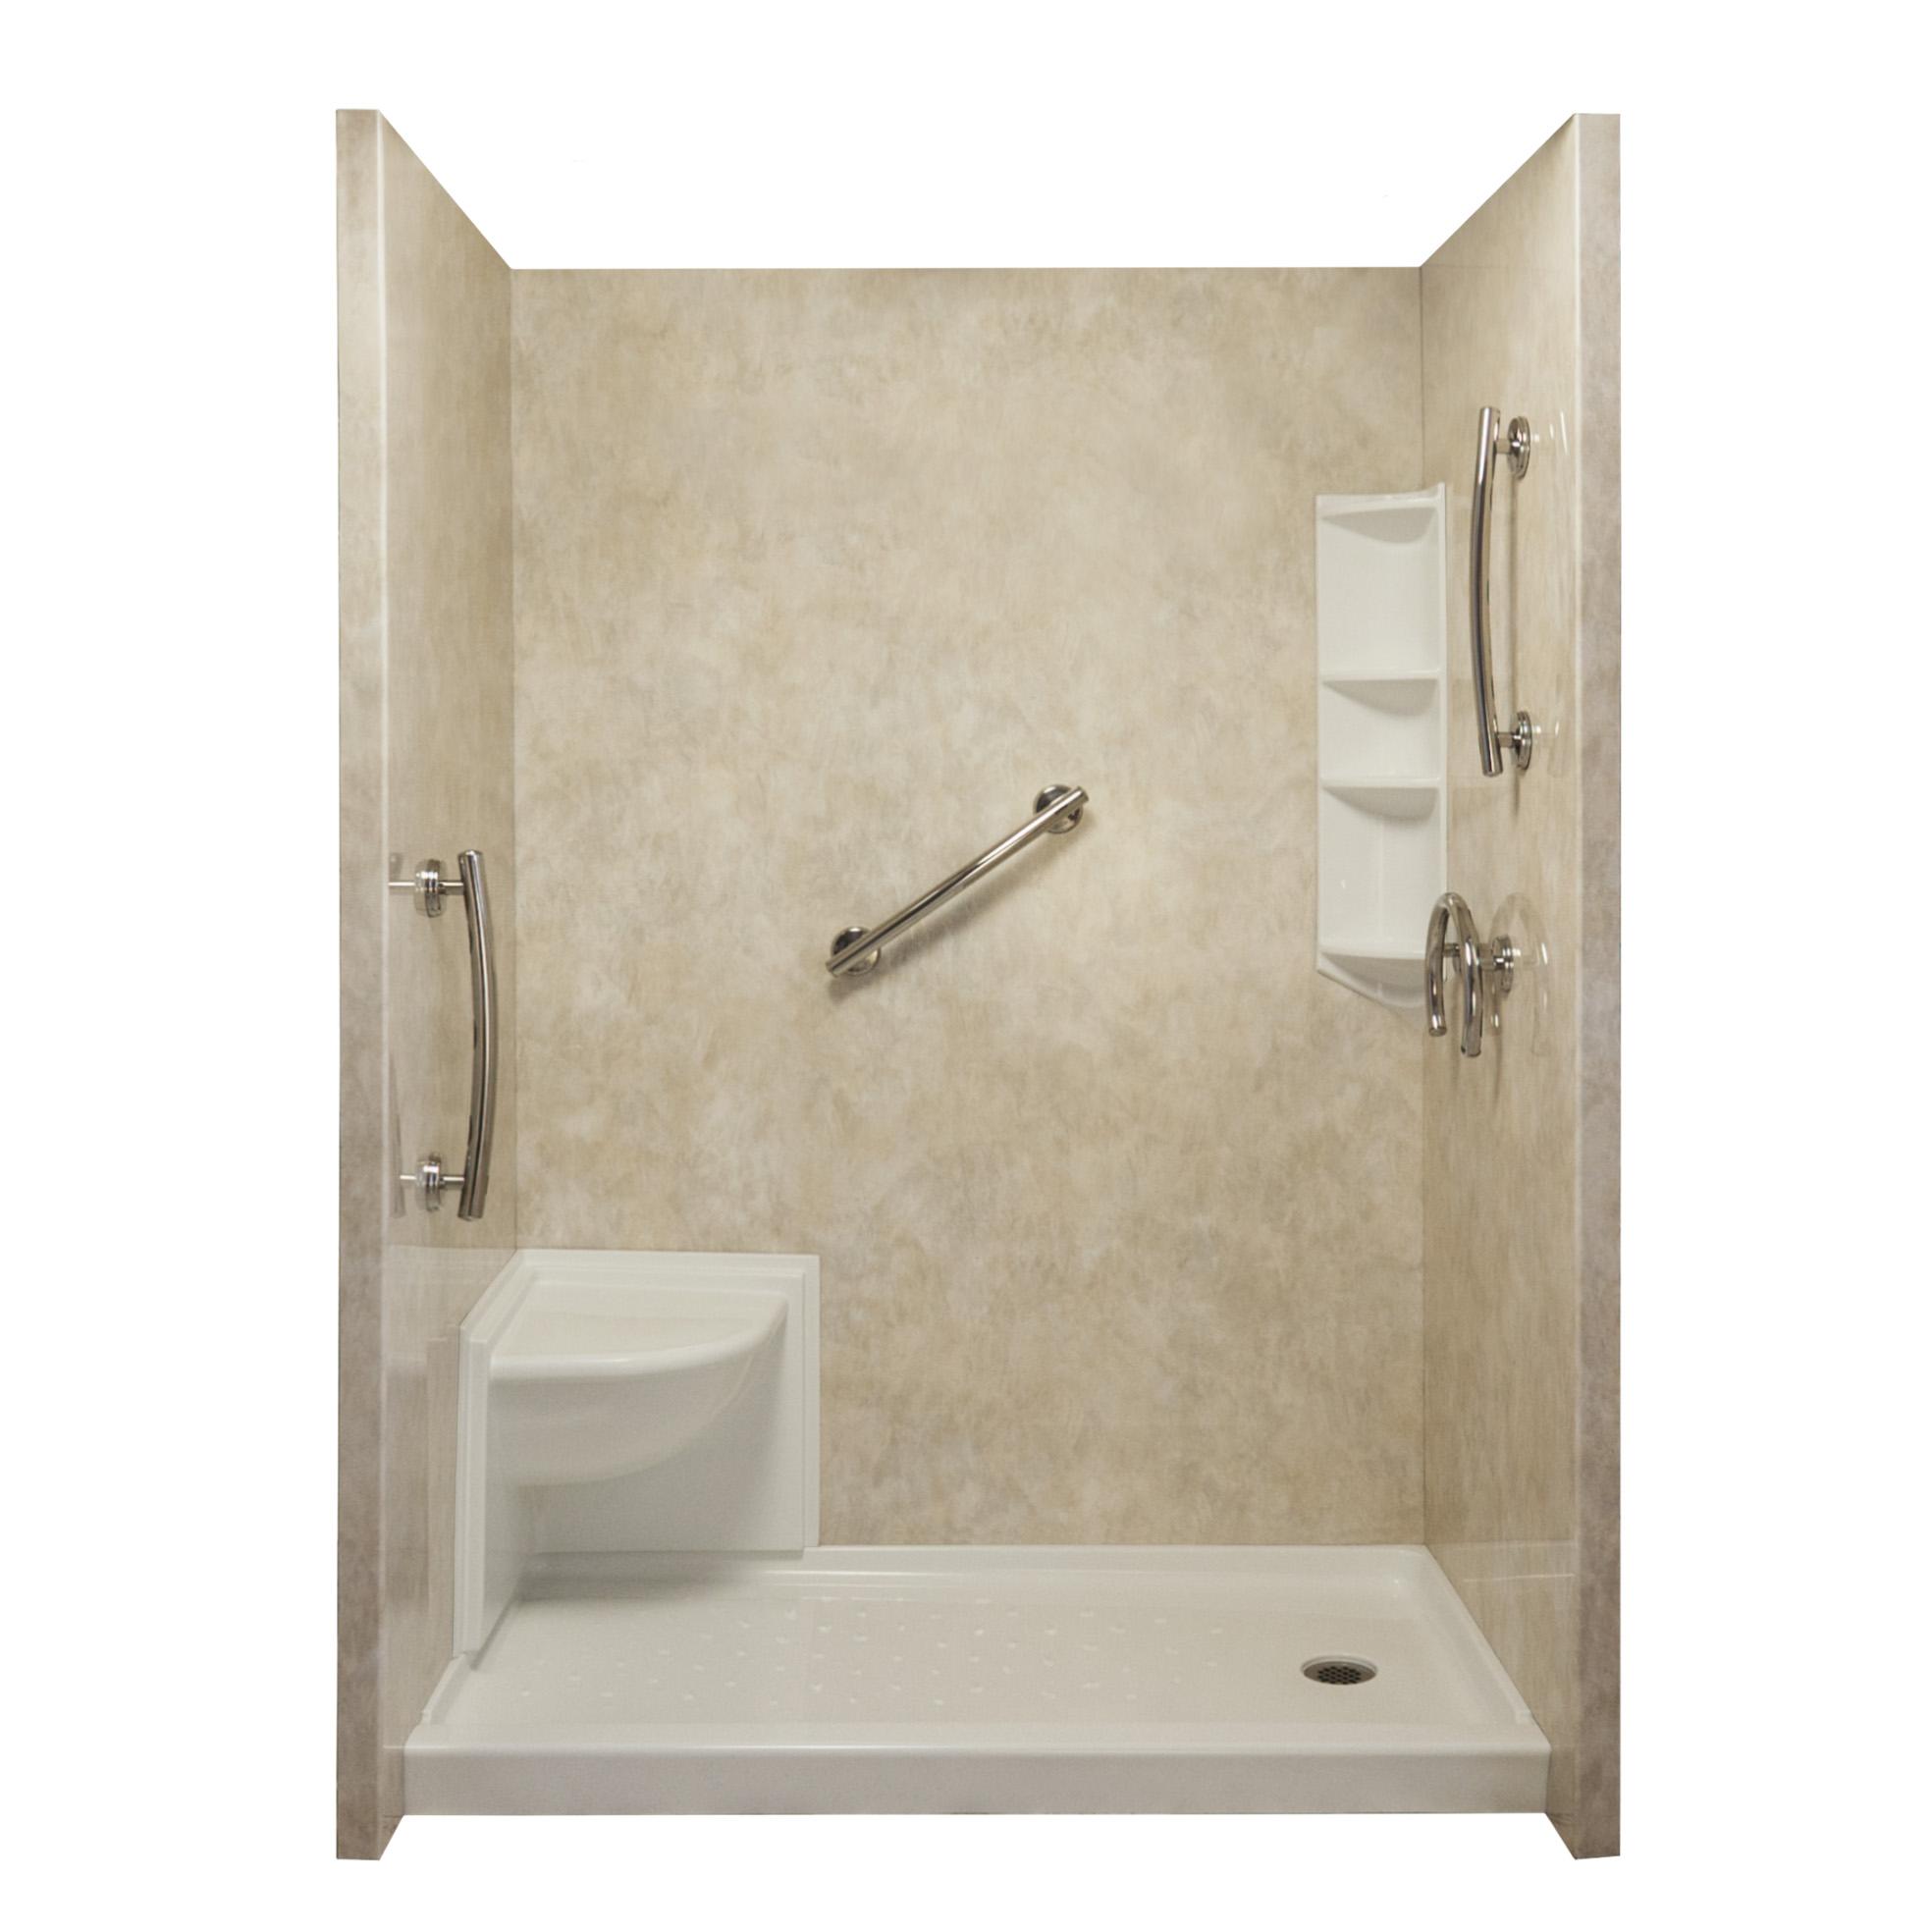 Bathroom remodeling dayton ohio - Bath Masters Dayton